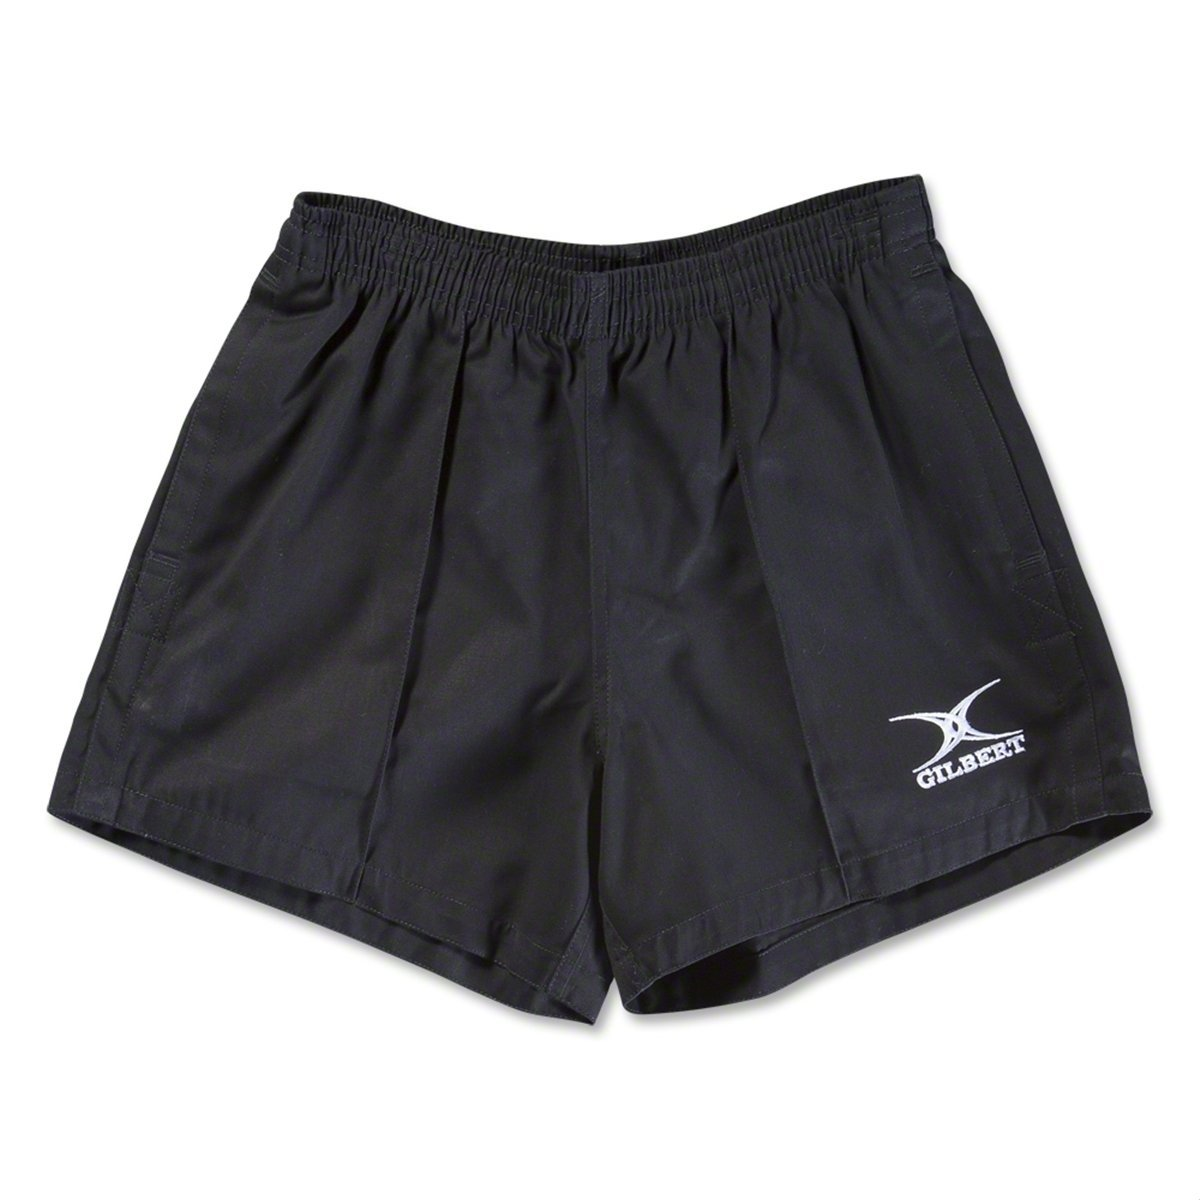 Gilbert Kiwi Pro - Pantalones Cortos para Hombre